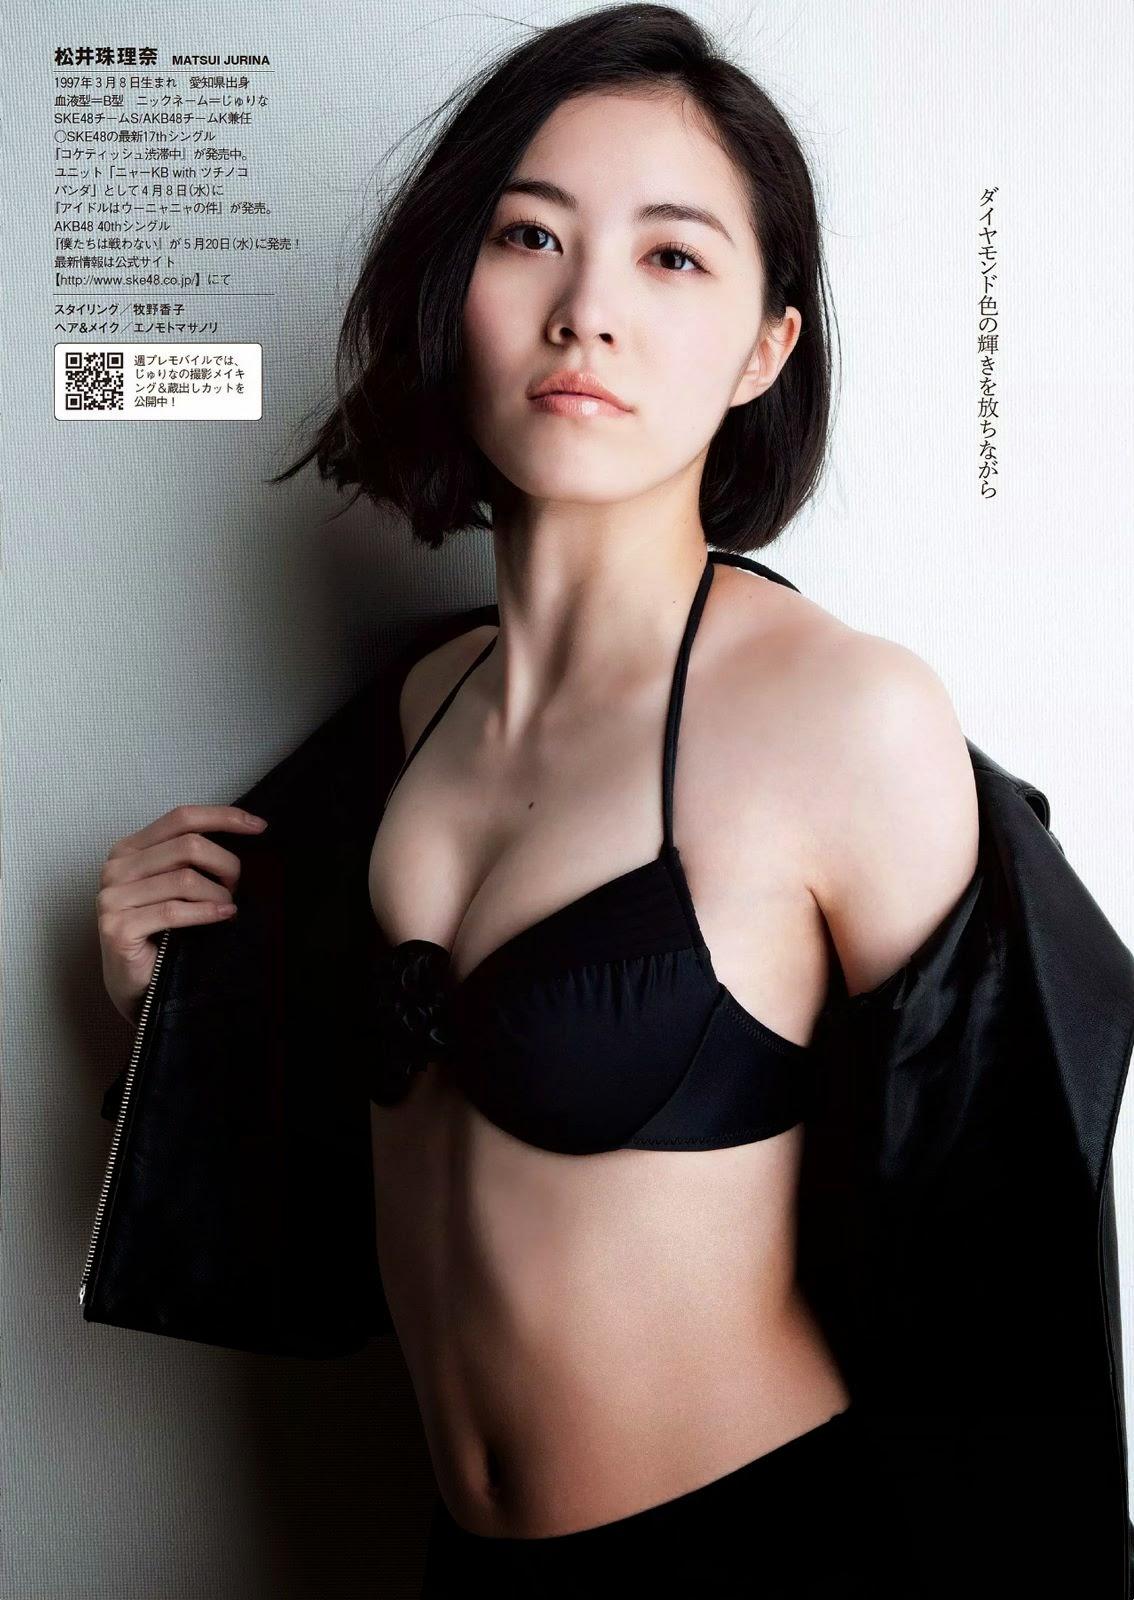 Matsui Jurina 松井珠理奈 18 Years (18歳) Images 7